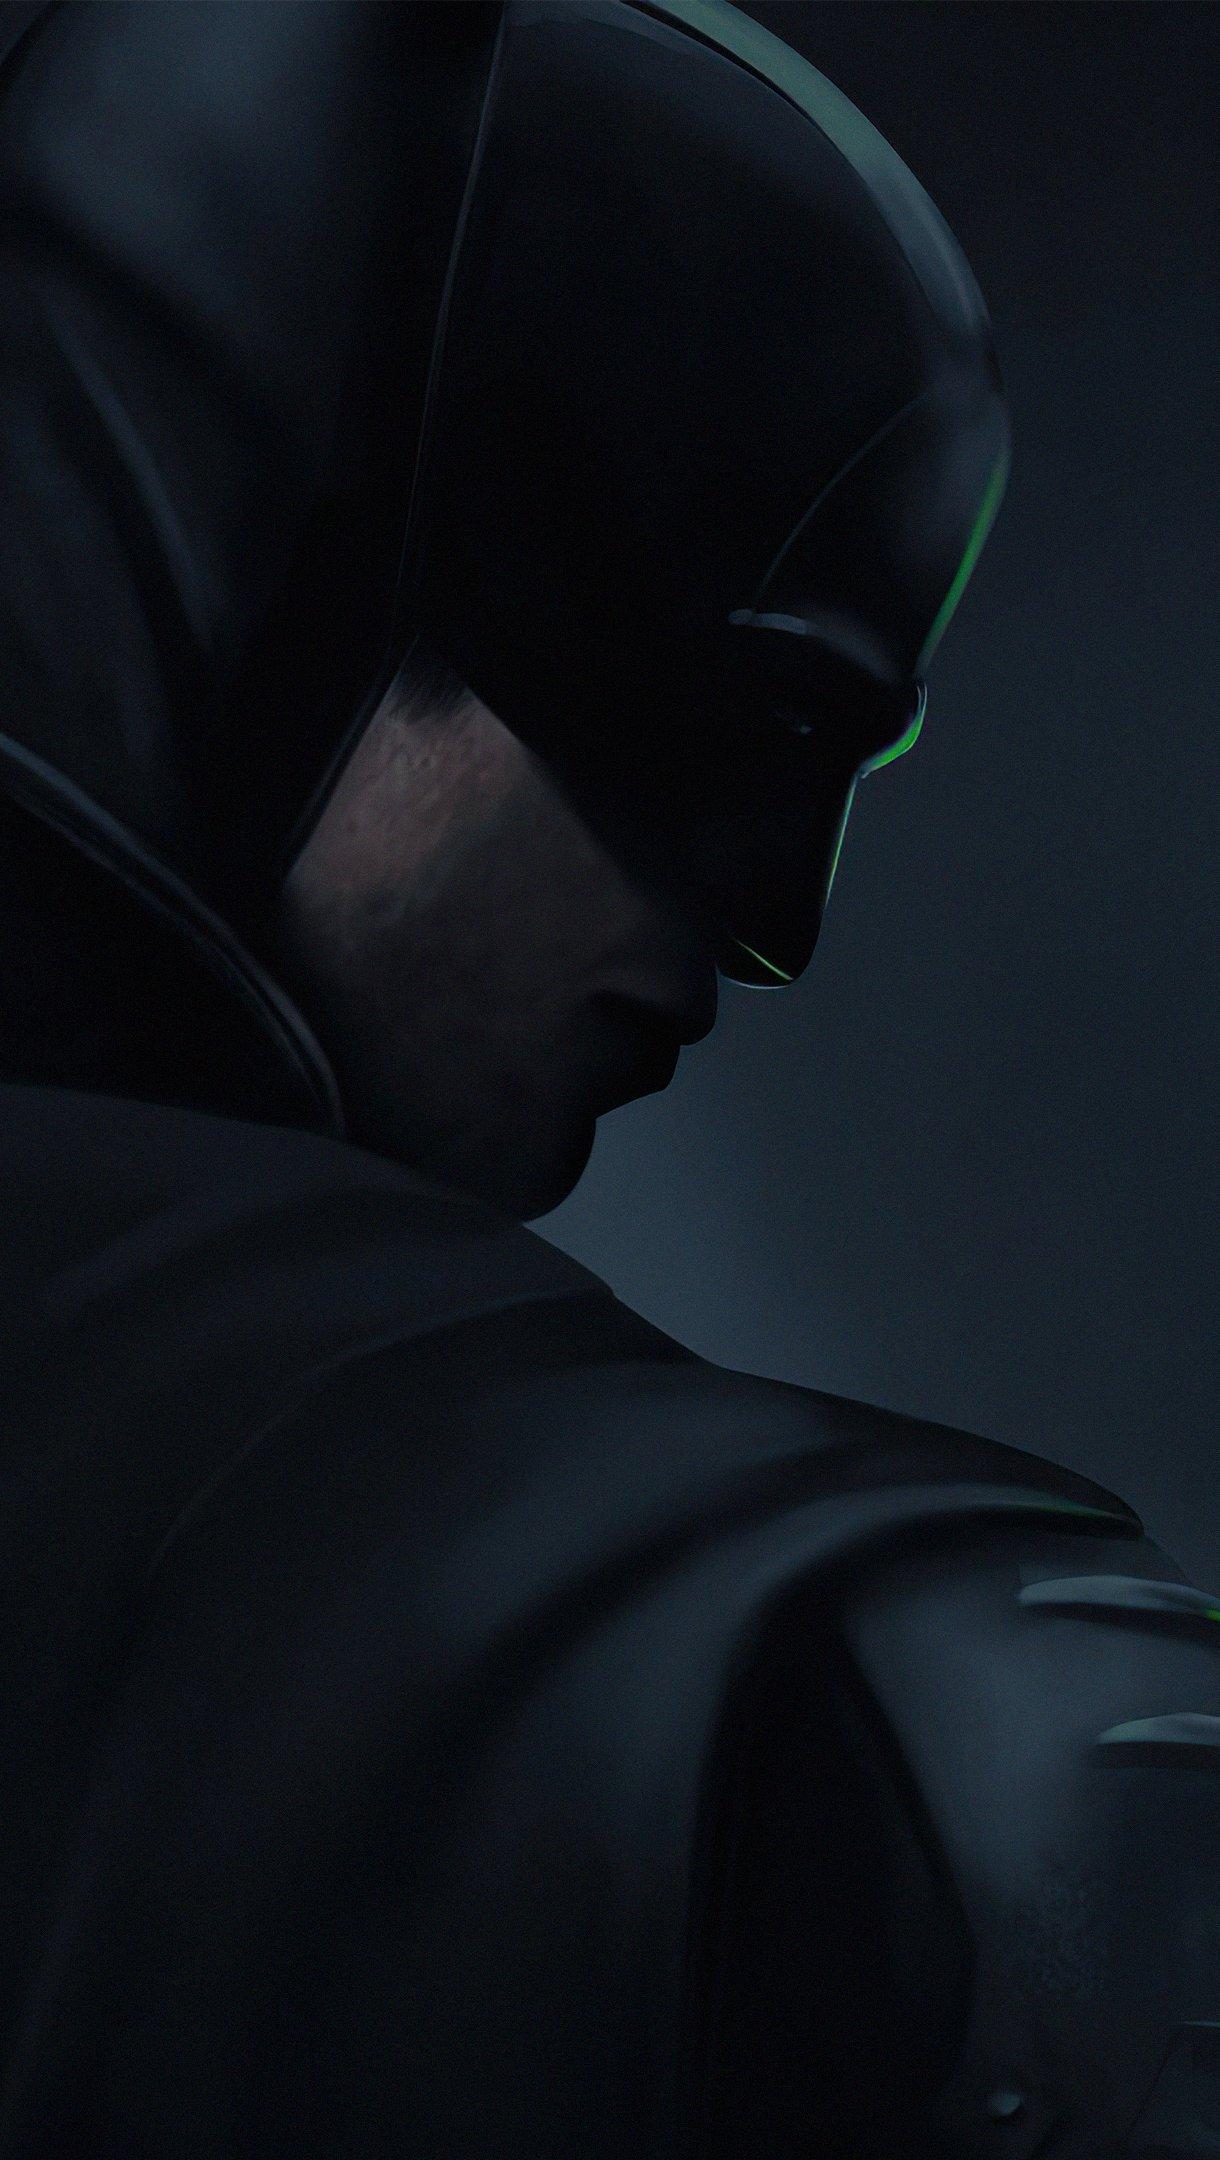 Fondos de pantalla The Batman 2022 Vertical